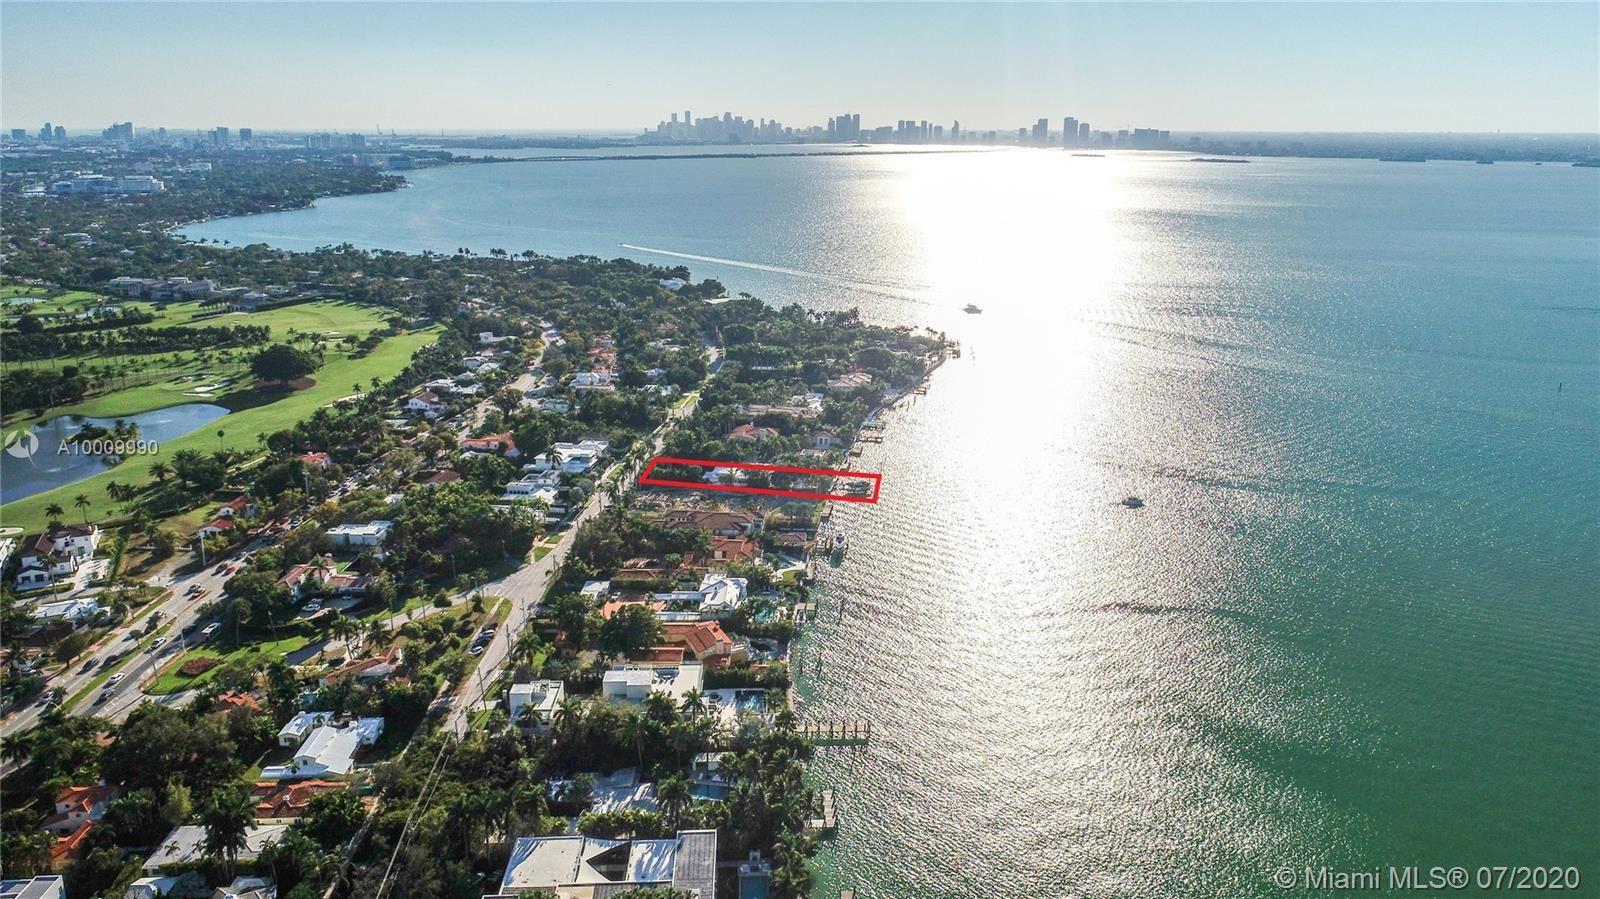 Photo 3 of Listing MLS a10009990 in 6050 N Bay Rd Miami Beach FL 33140